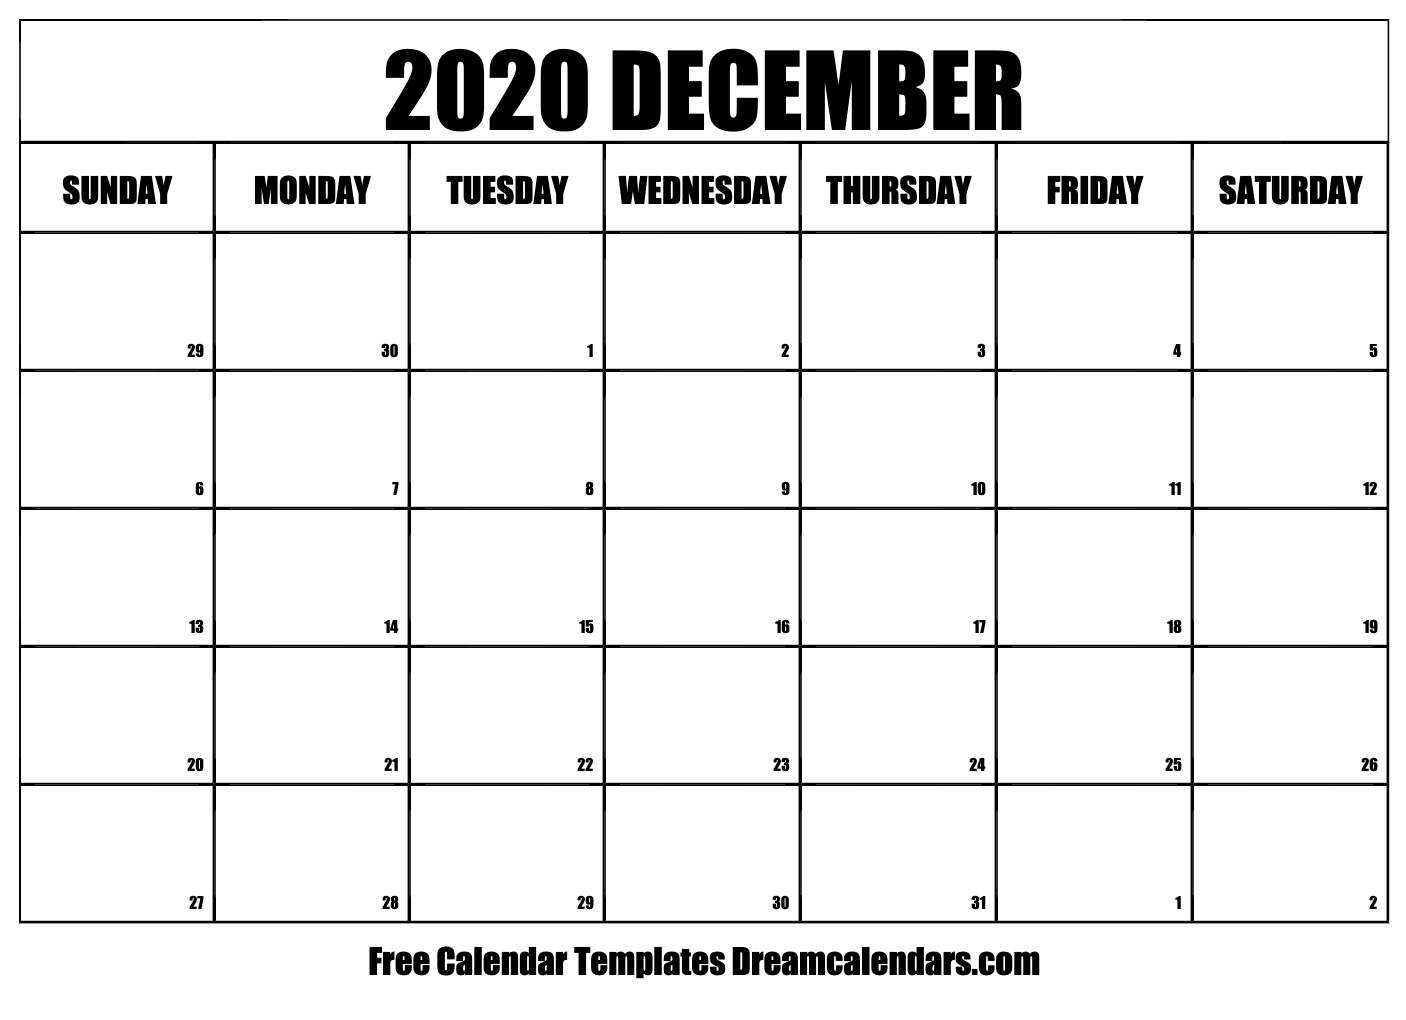 Free Blank December 2020 Printable Calendar inside Calander December 2020